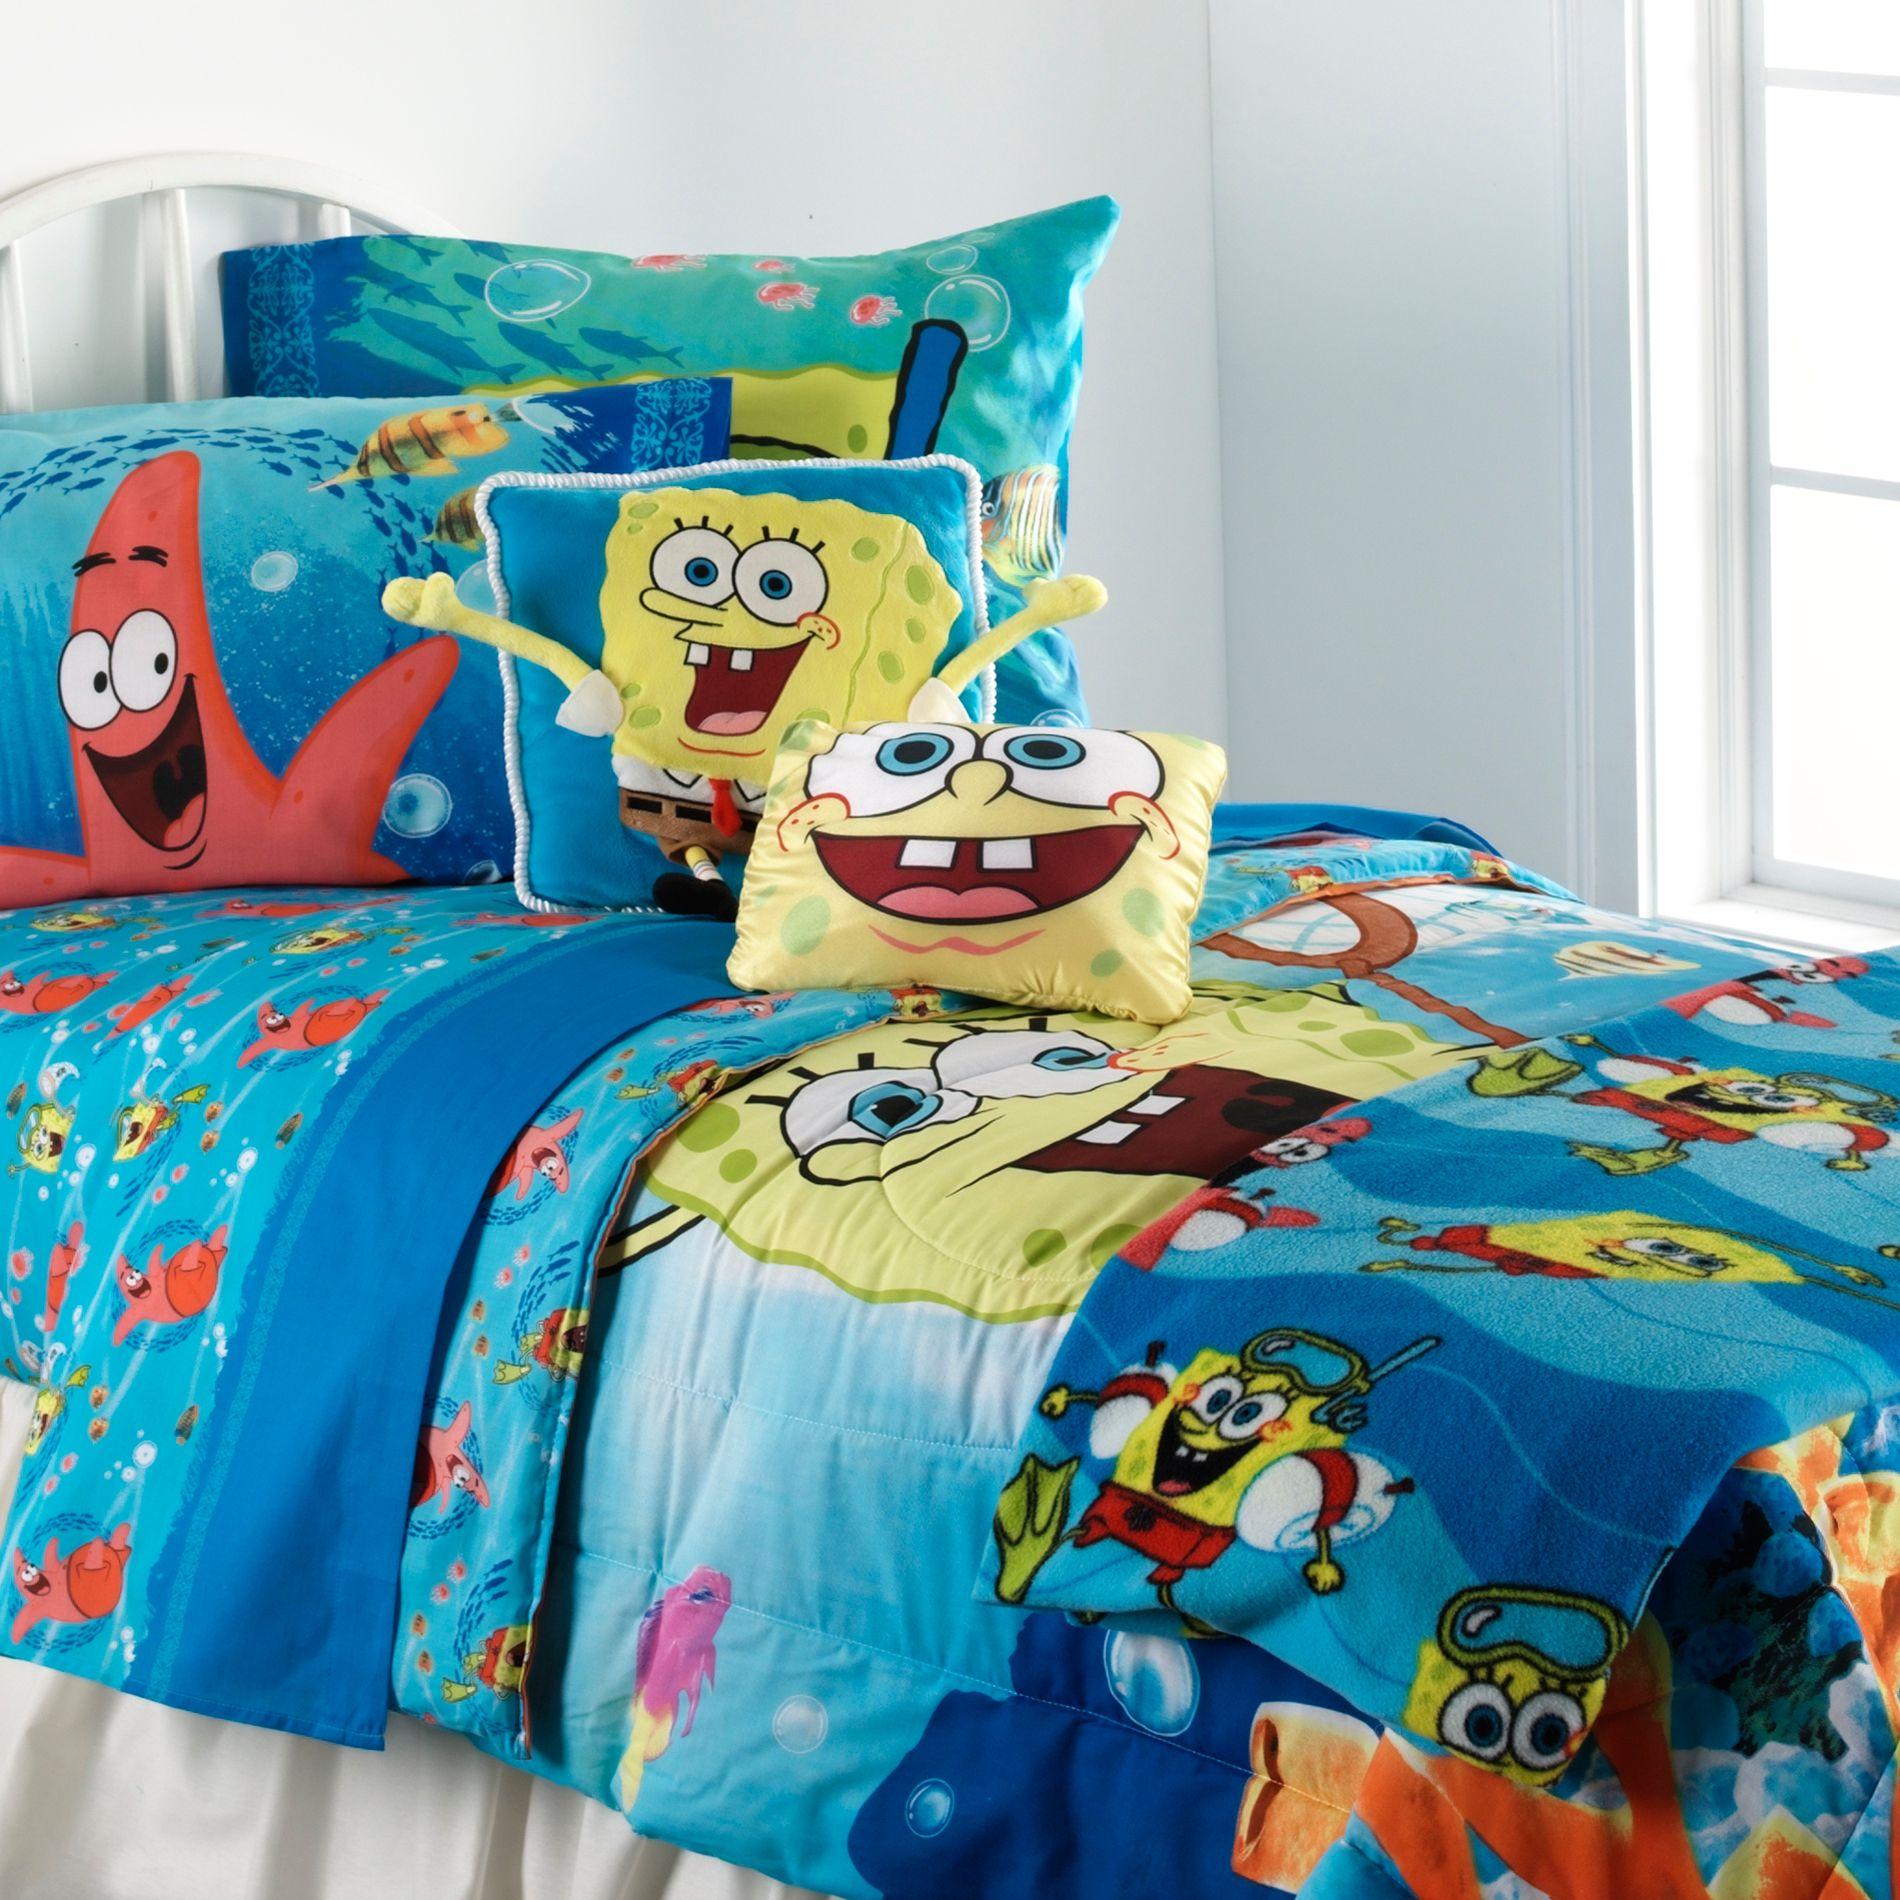 Spongebob Squarepants Sheet Set - Home Bed & Bath